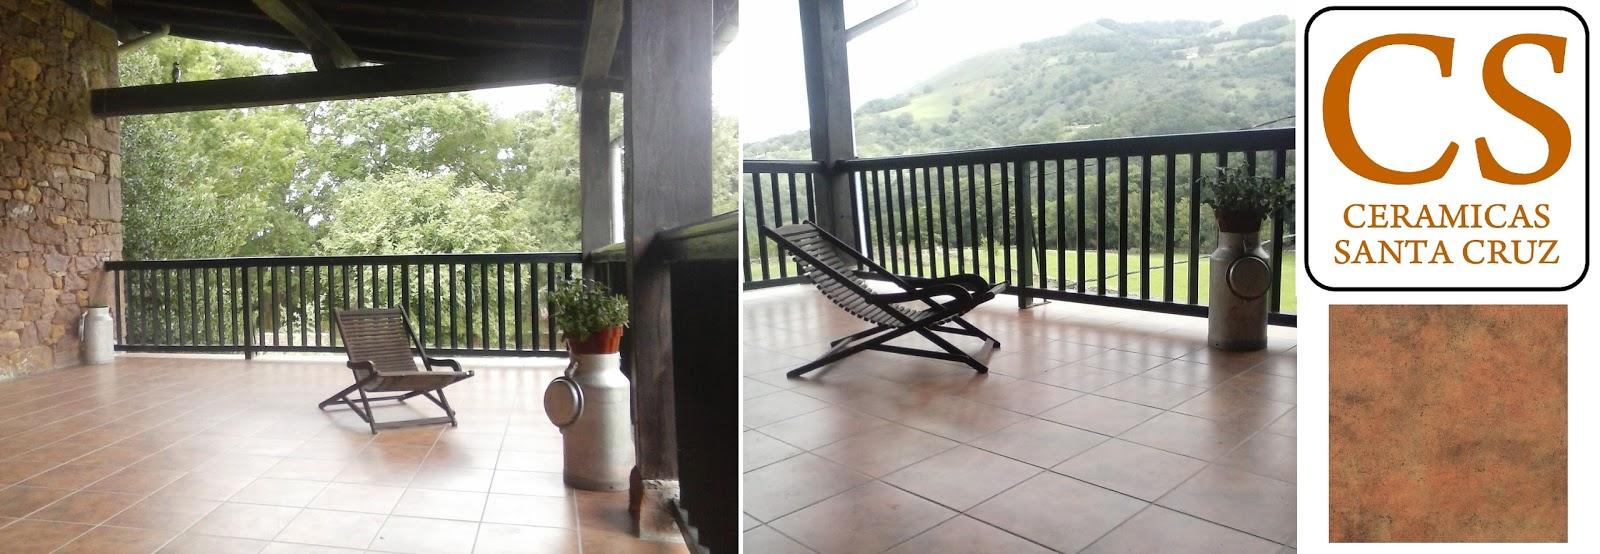 baldosas de gres para terraza exterior de caserio en el norte de navarra with baldosa terraza